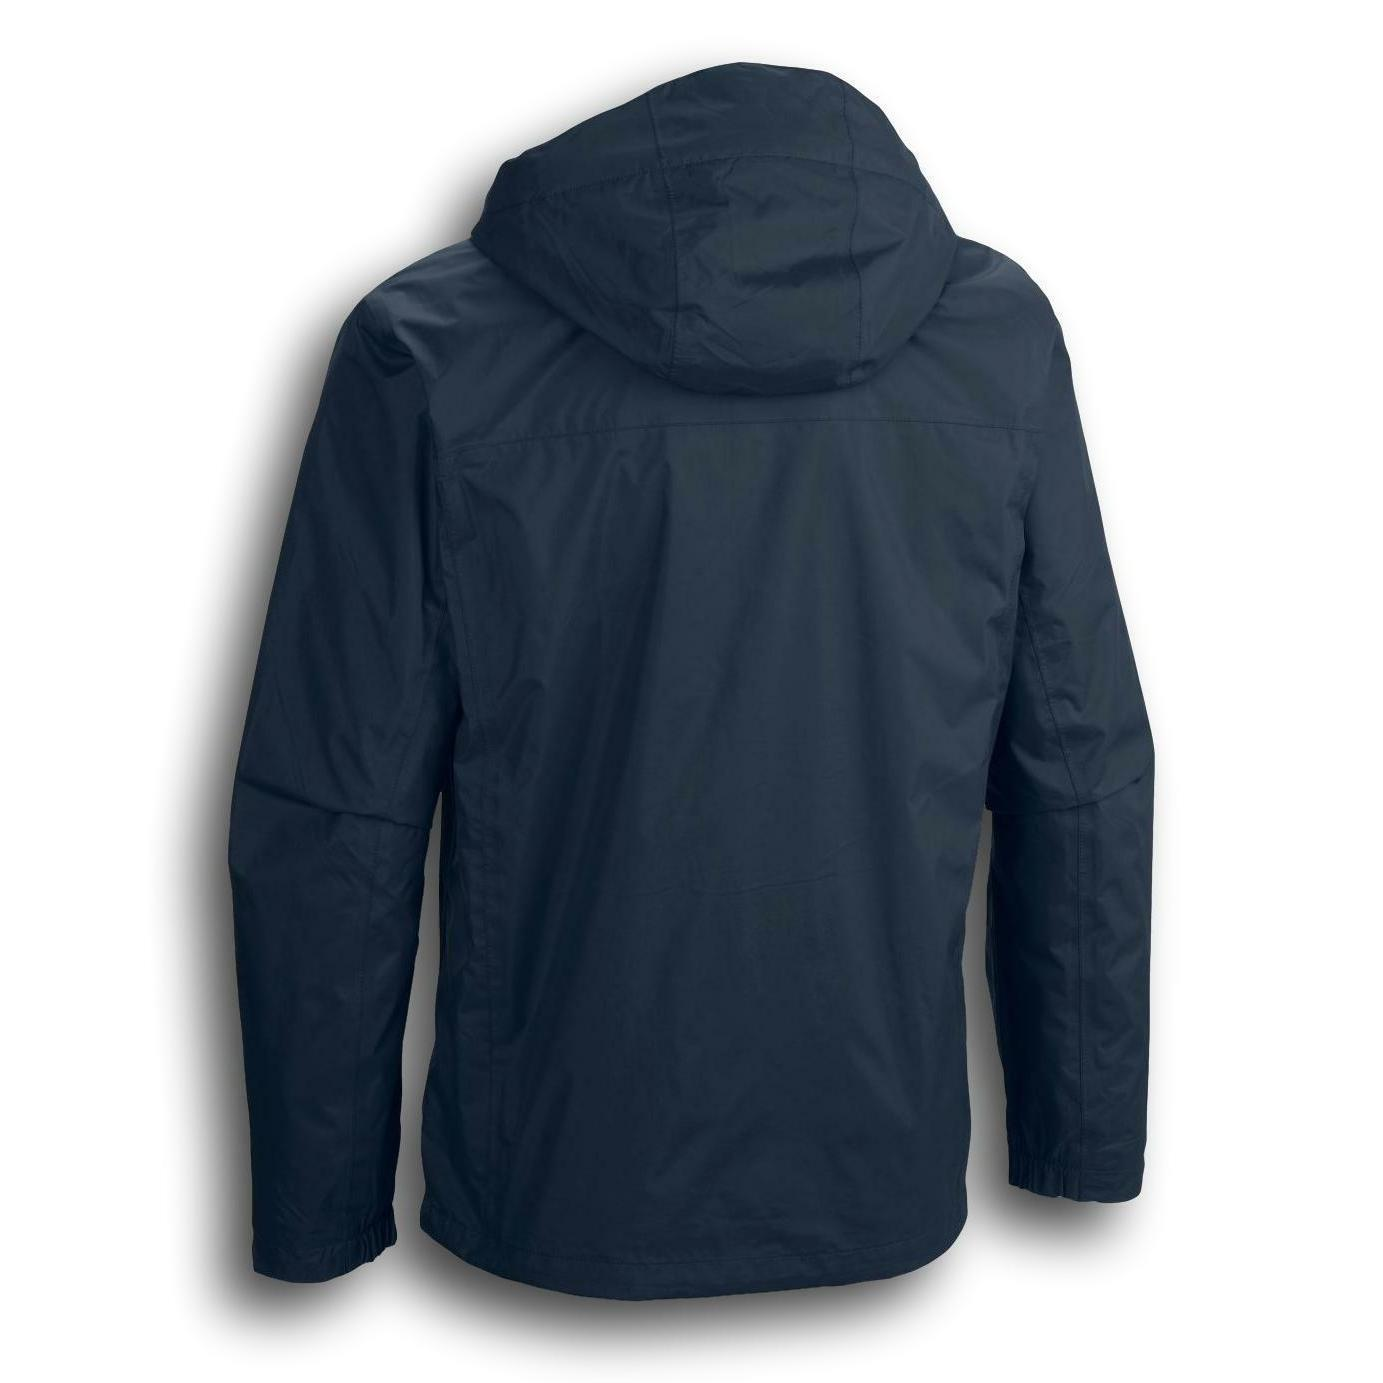 New Pointe waterproof hooded rain jacket coat Tall